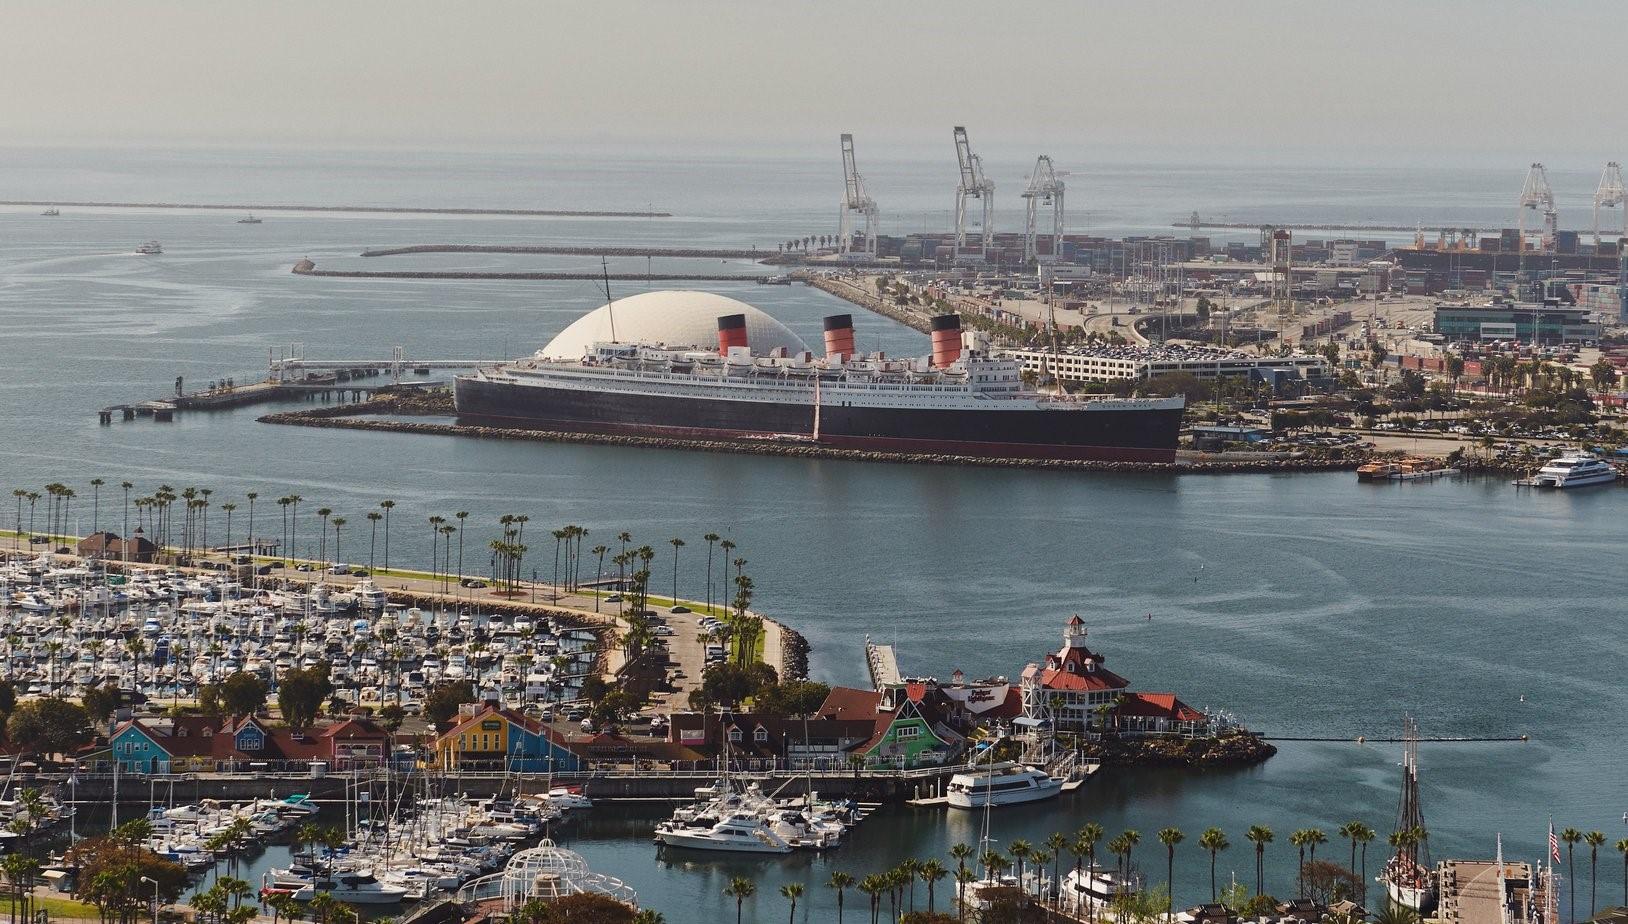 California Port City Sheds Its